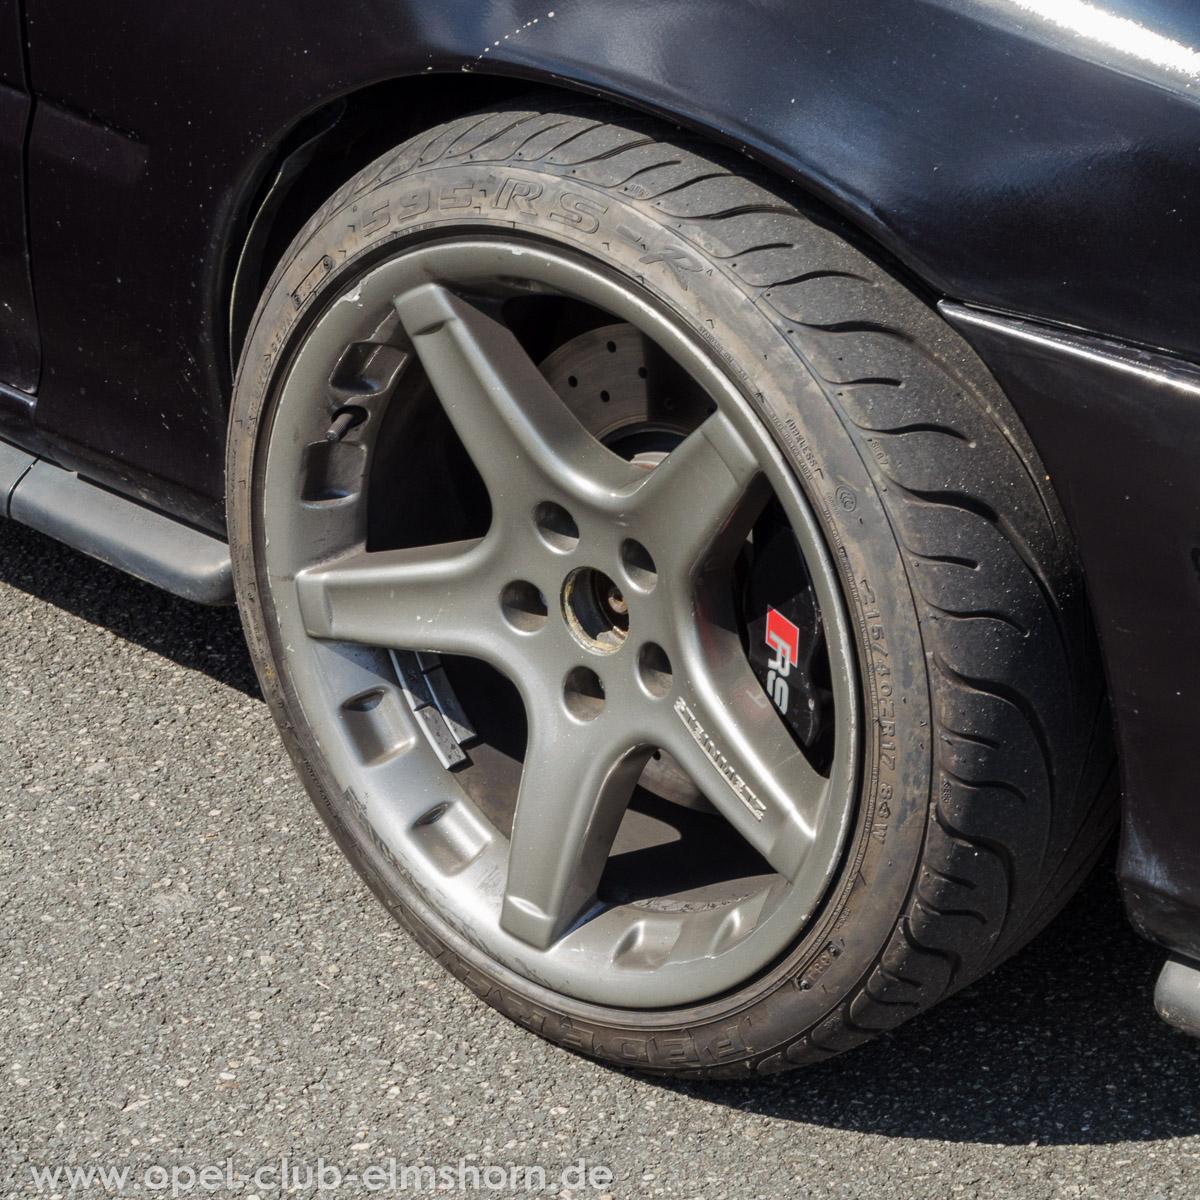 Zeven-2014-0122-Semislicks-am-Opel-Calibra-turbo